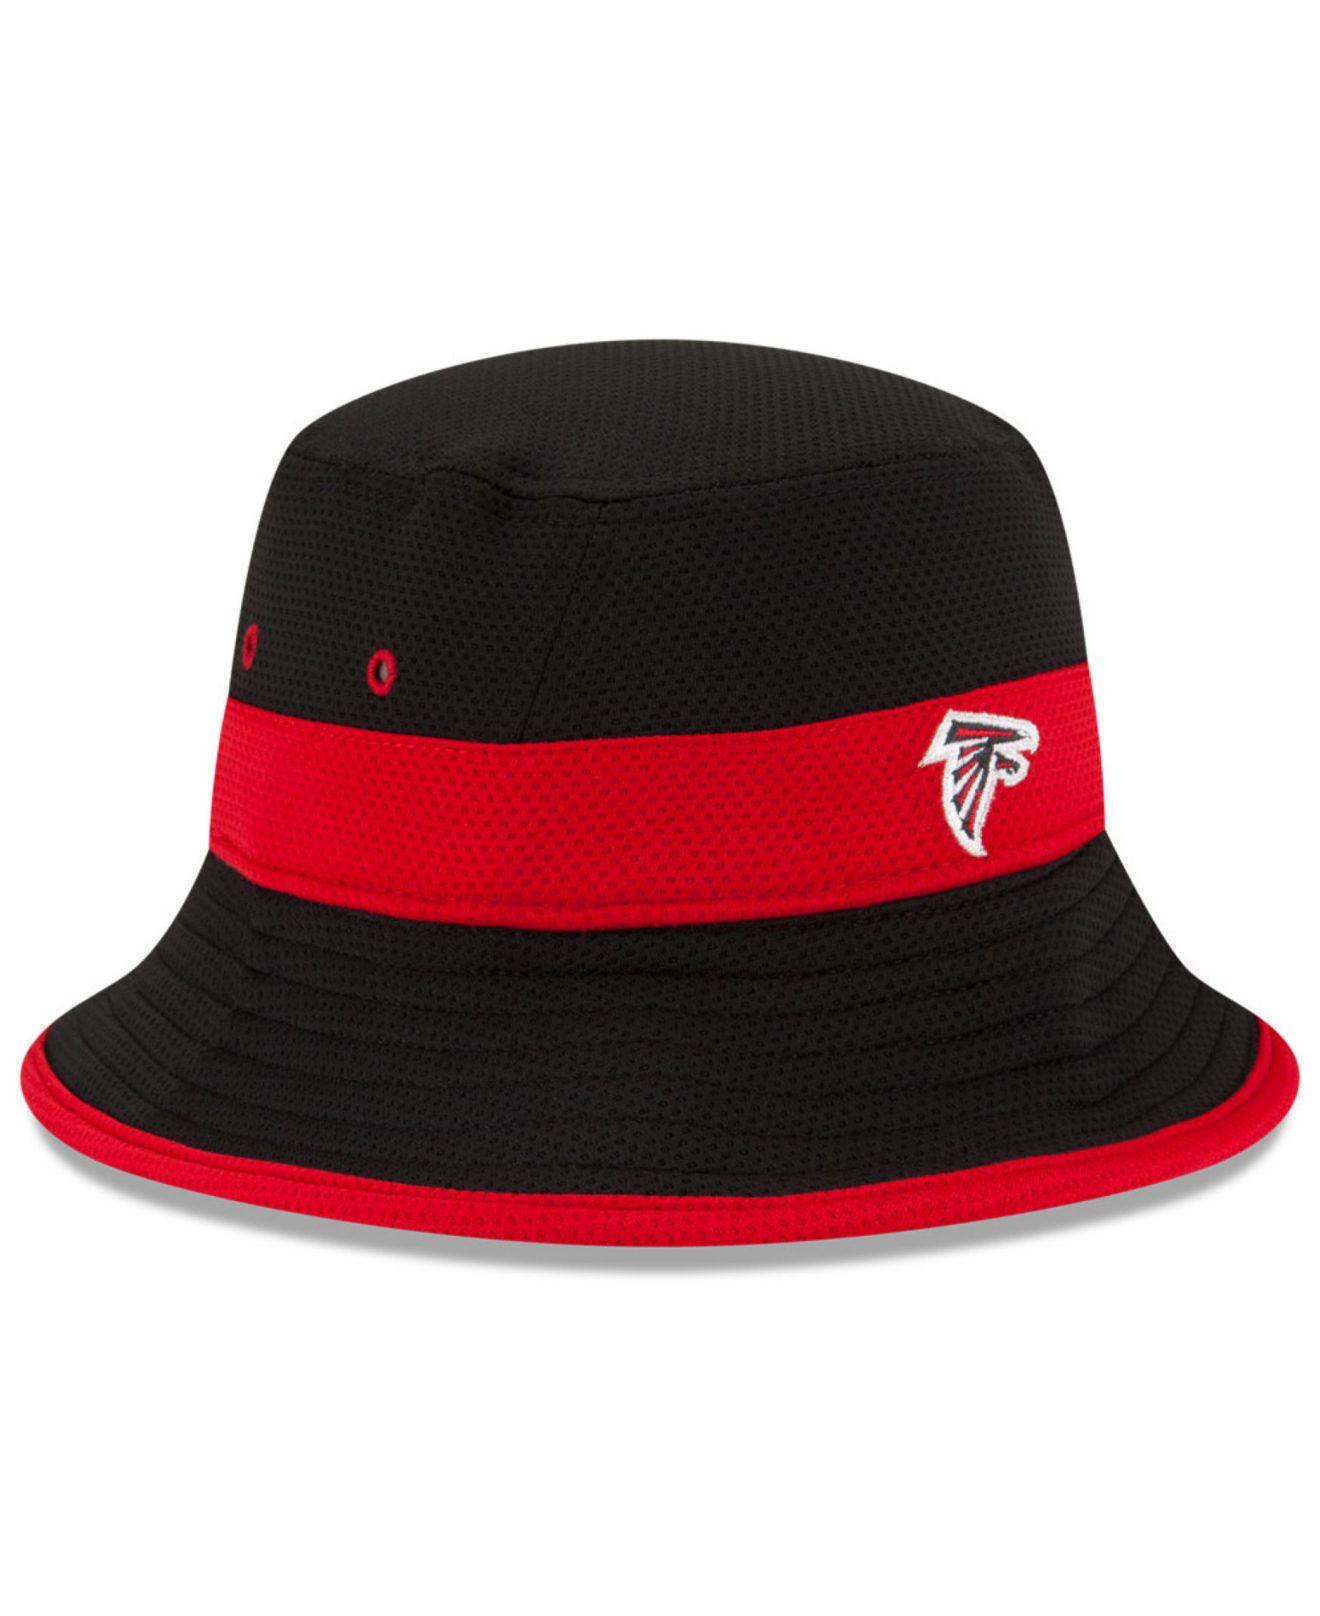 ef07e539289 Lyst - Ktz Atlanta Falcons Training Camp Reverse Bucket Hat in Black ...